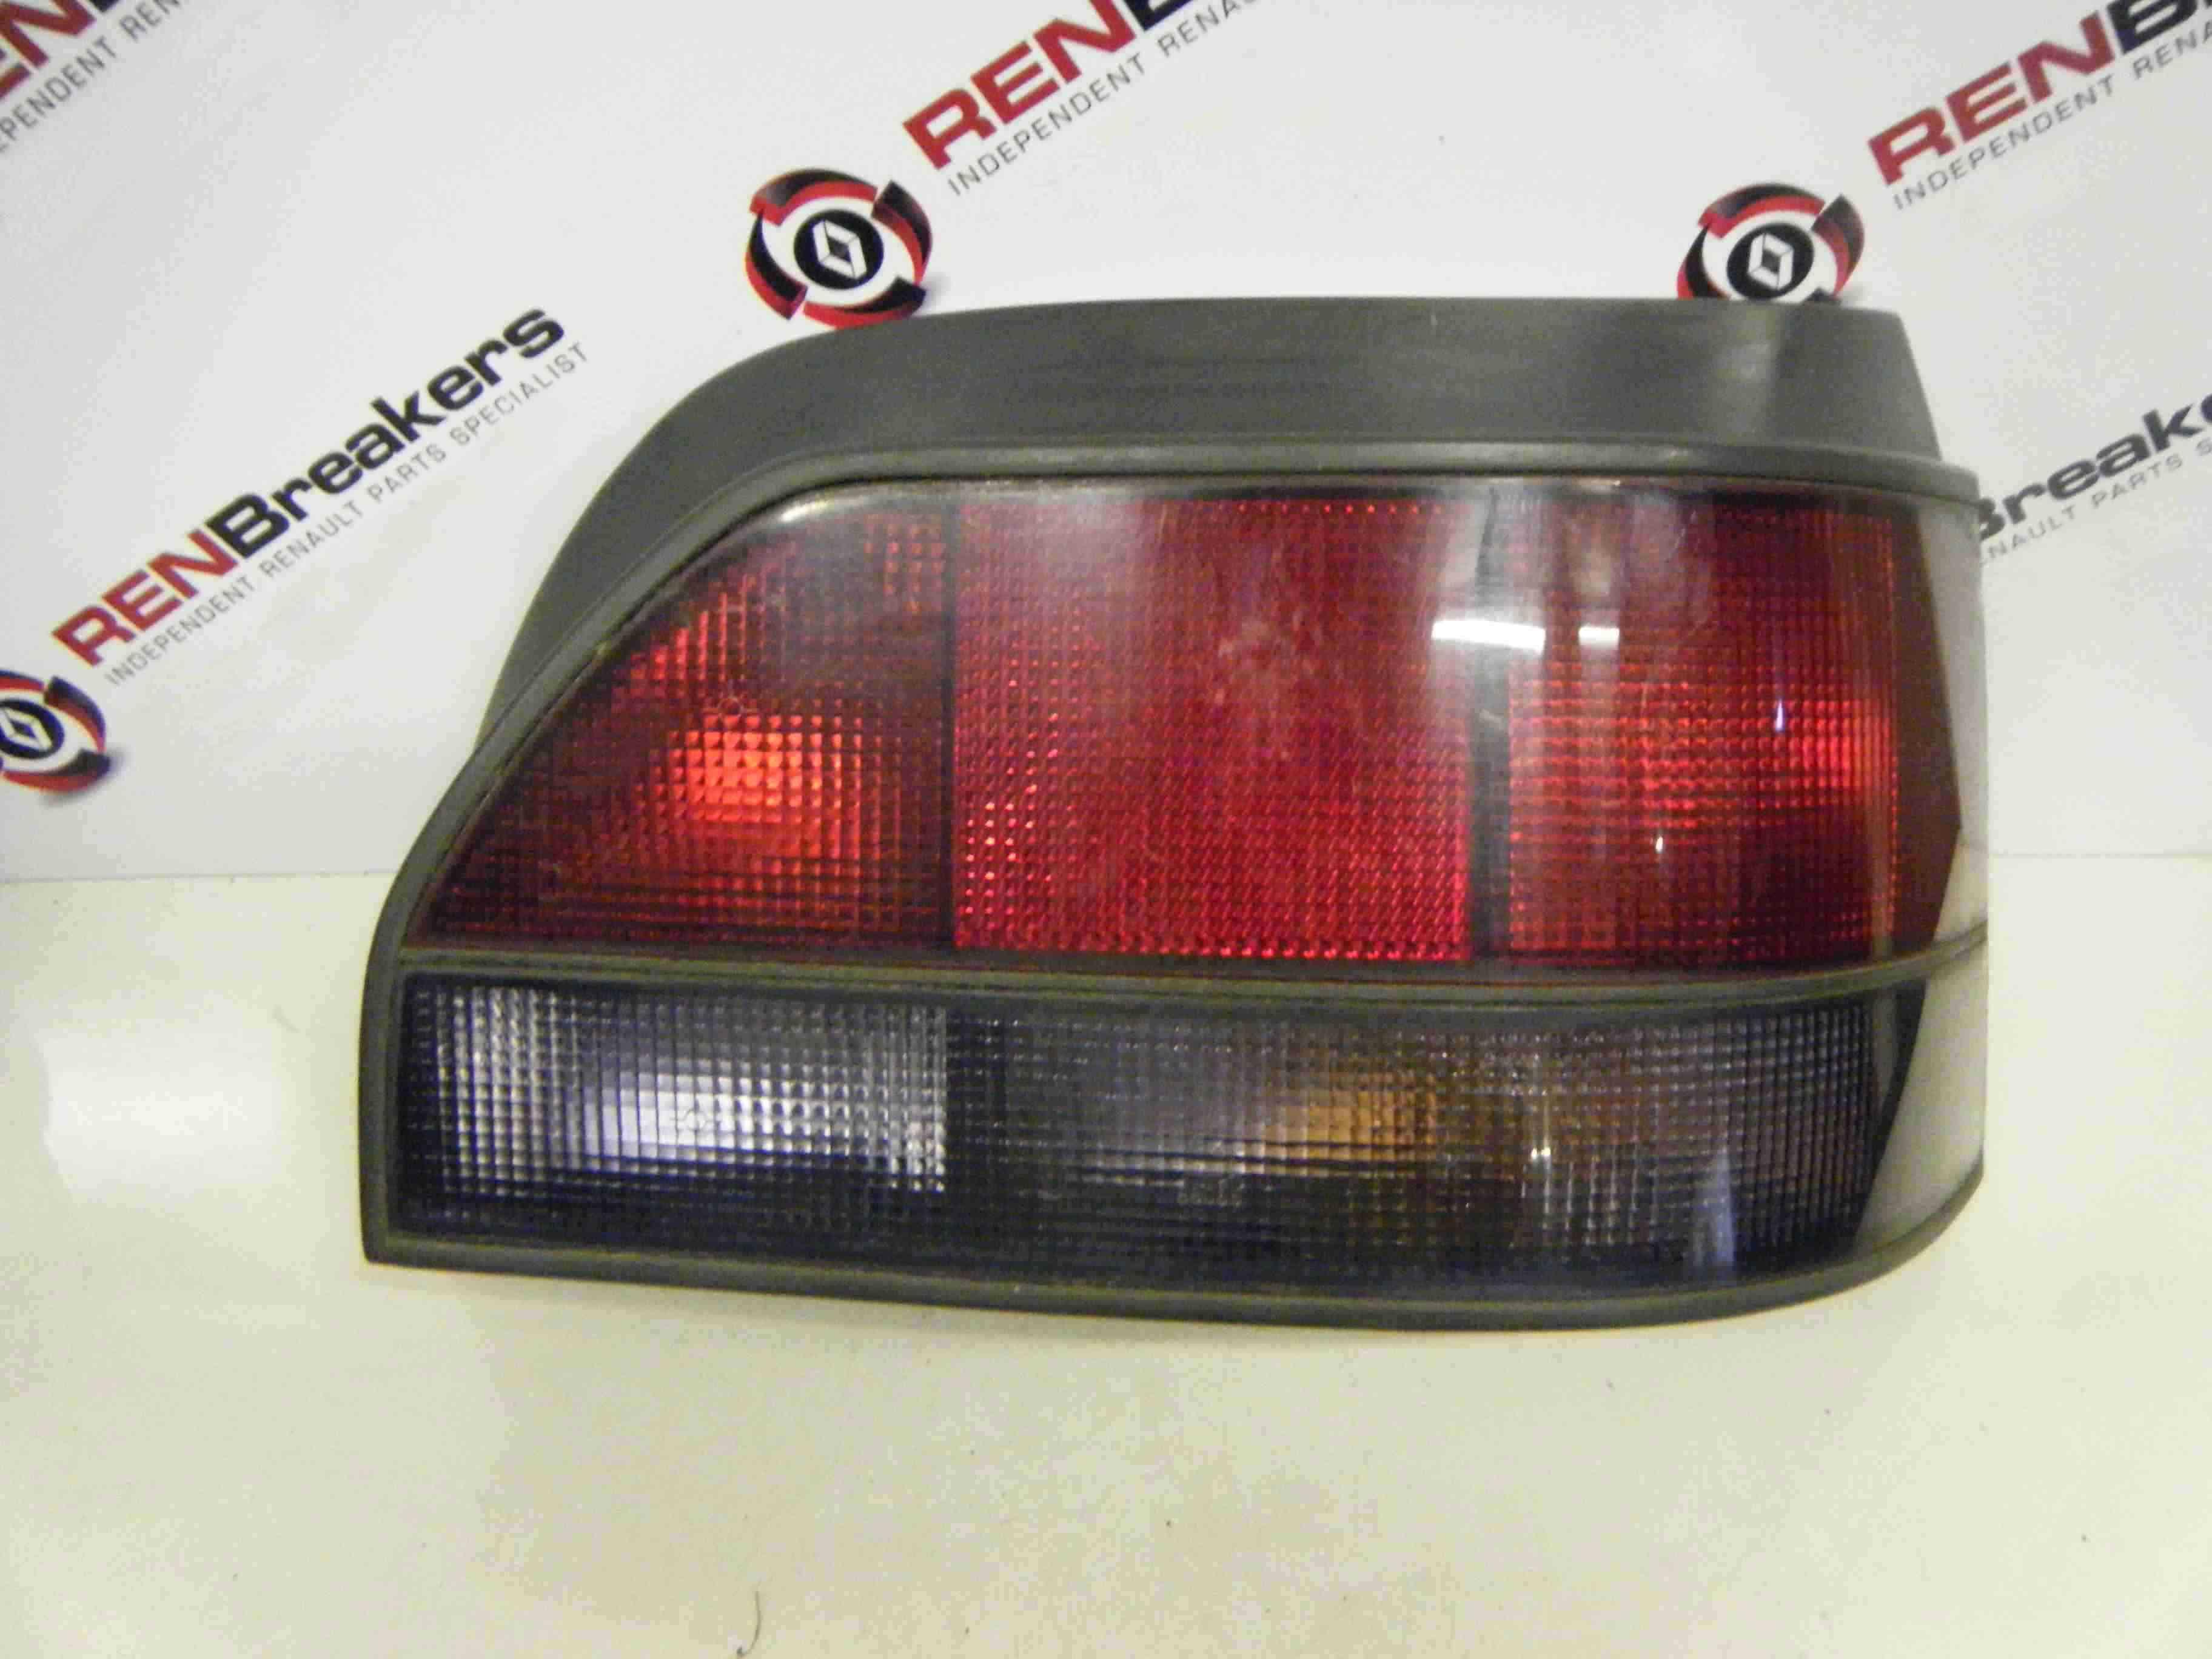 Renault Clio MK1 1990-1996 Drivers OSR Rear Light Lens 7700967